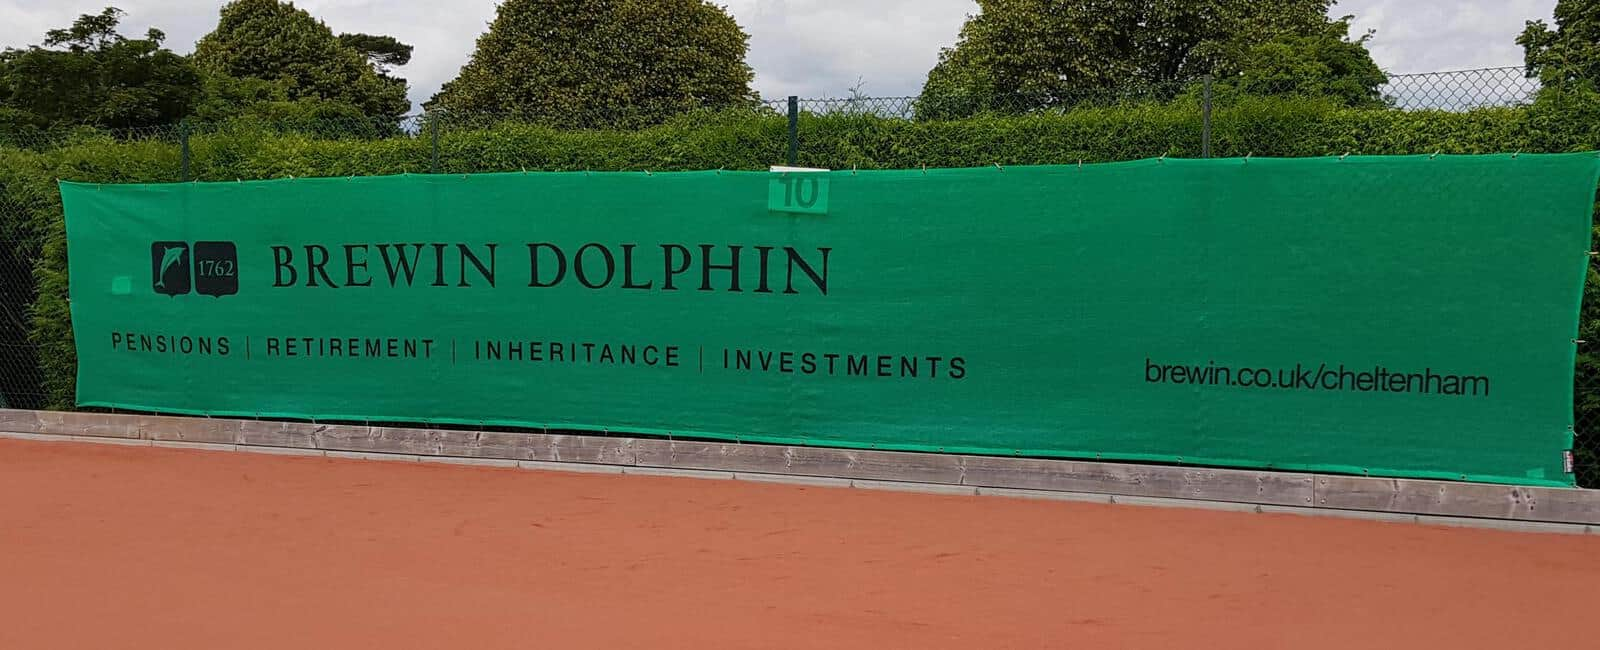 Brenwin Dolphin Austronet Branding